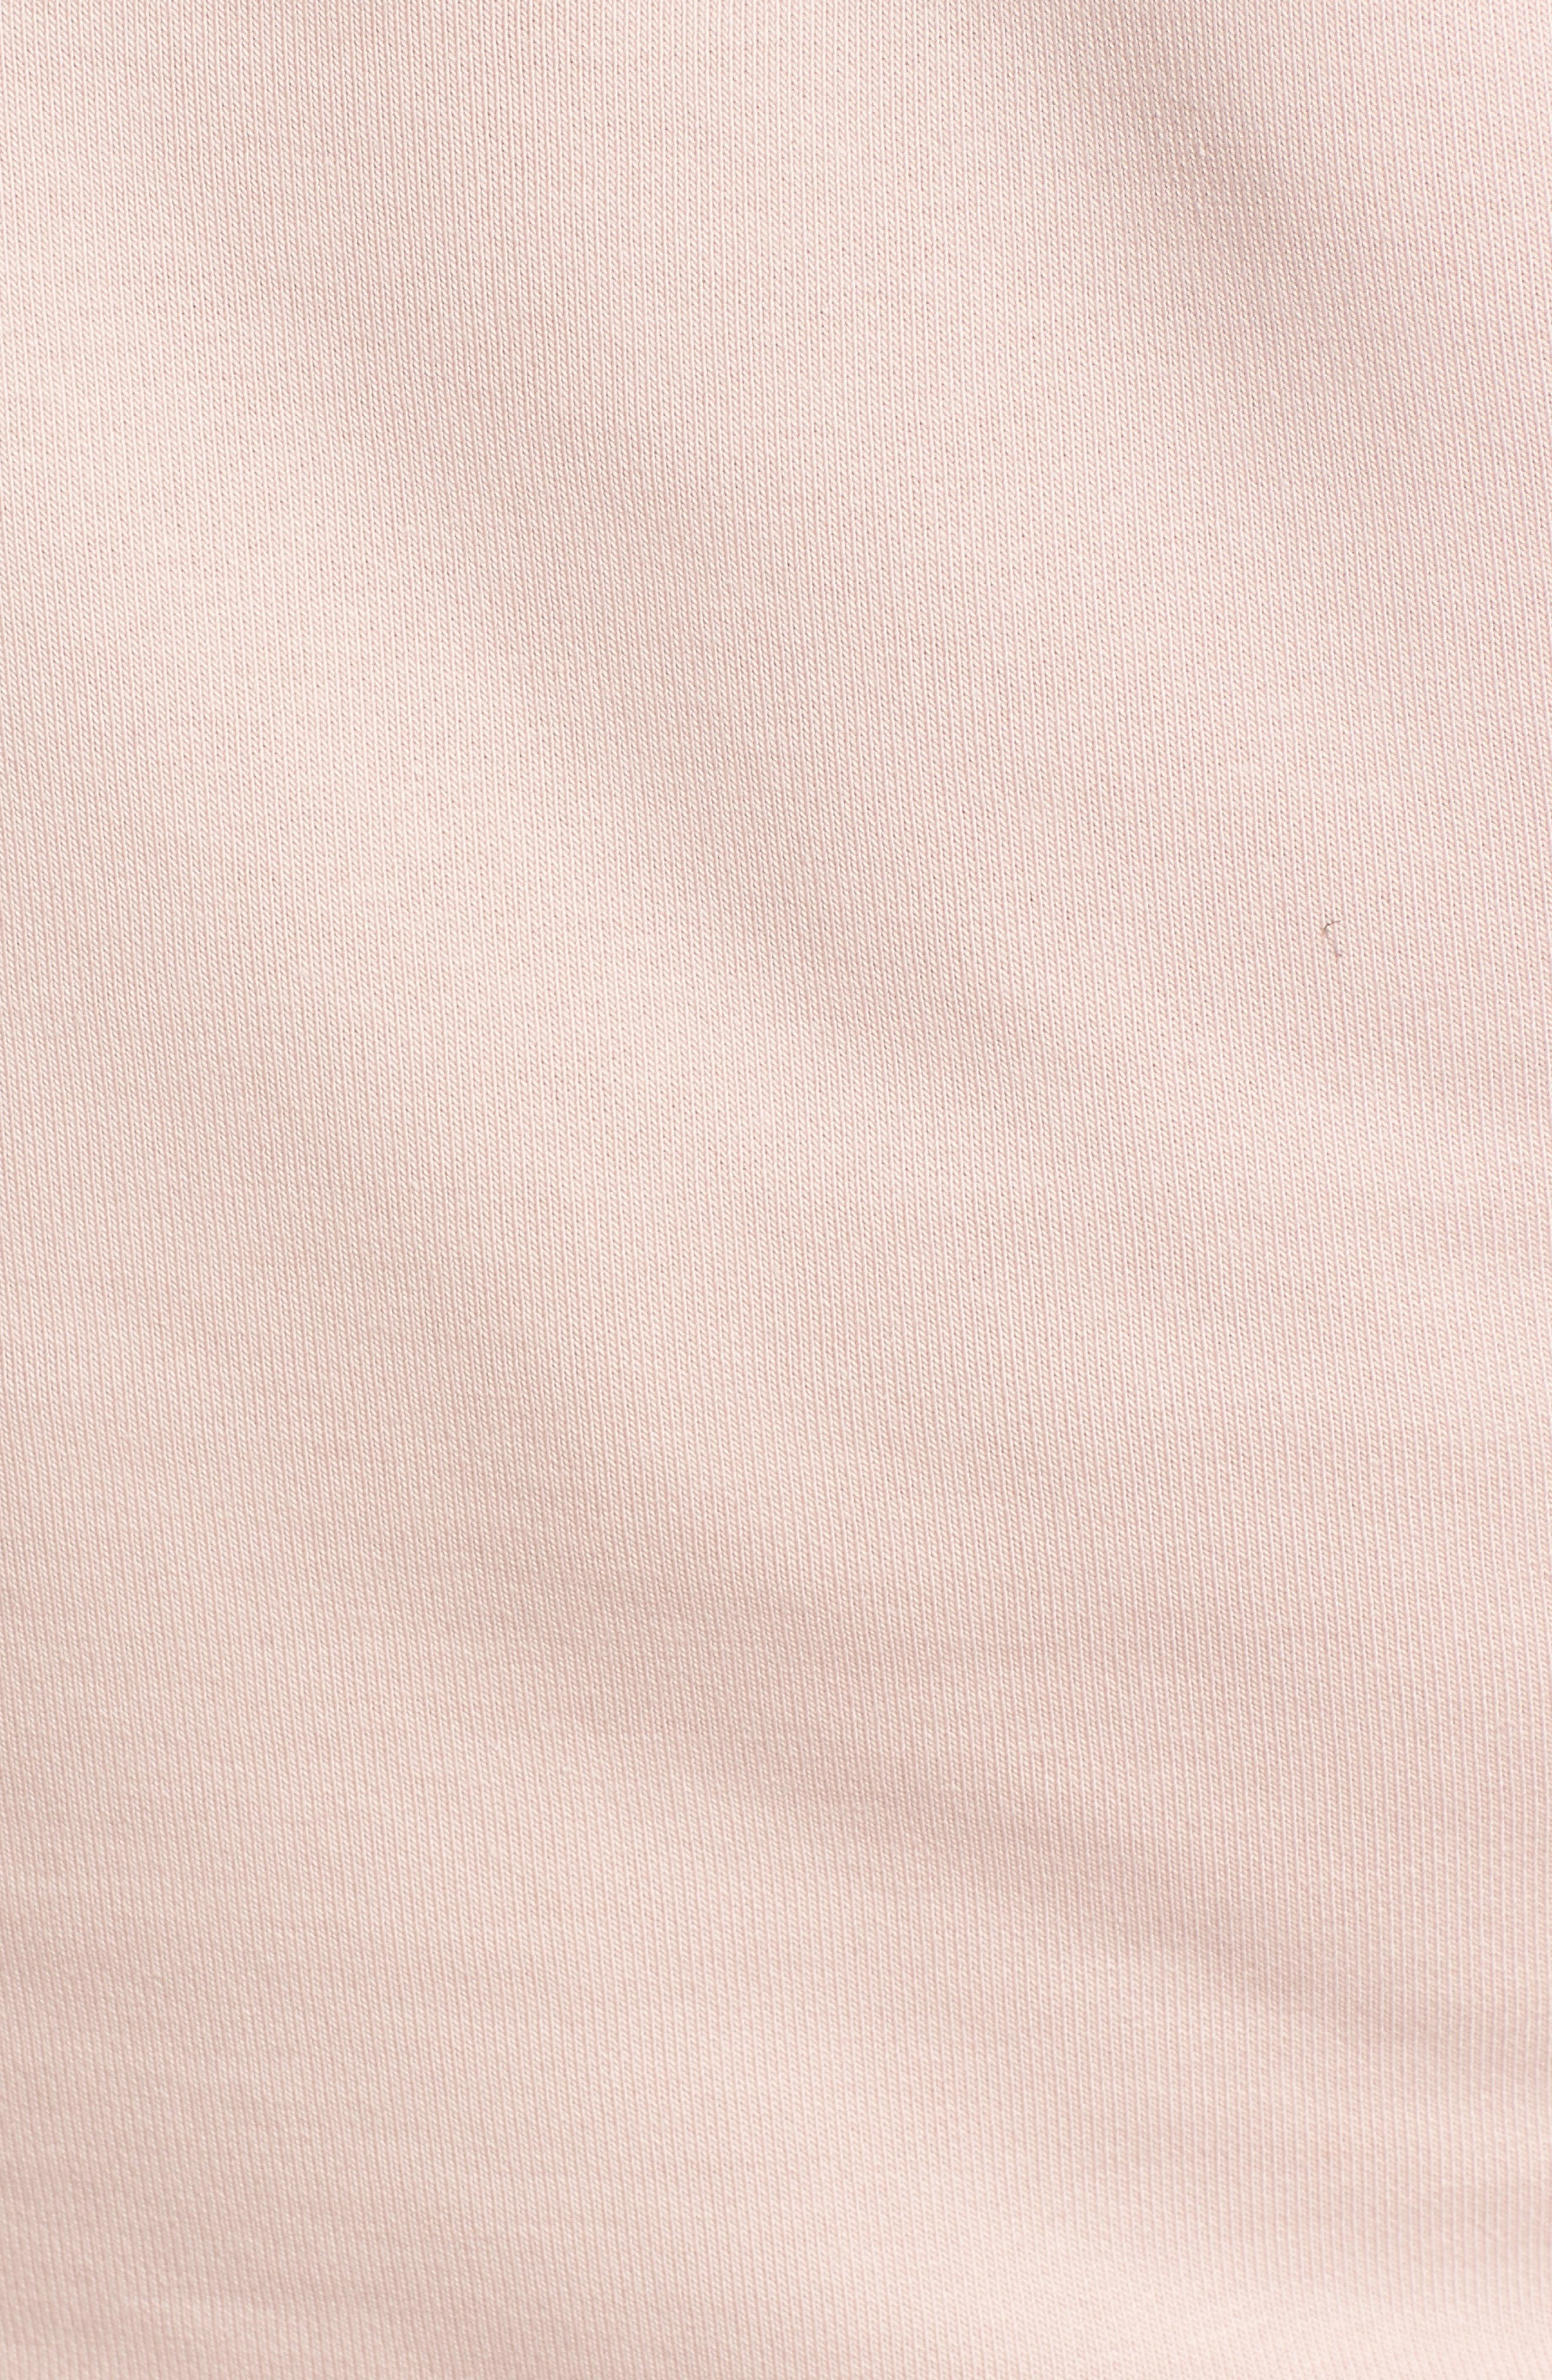 Football Lace-Up Sweatshirt,                             Alternate thumbnail 6, color,